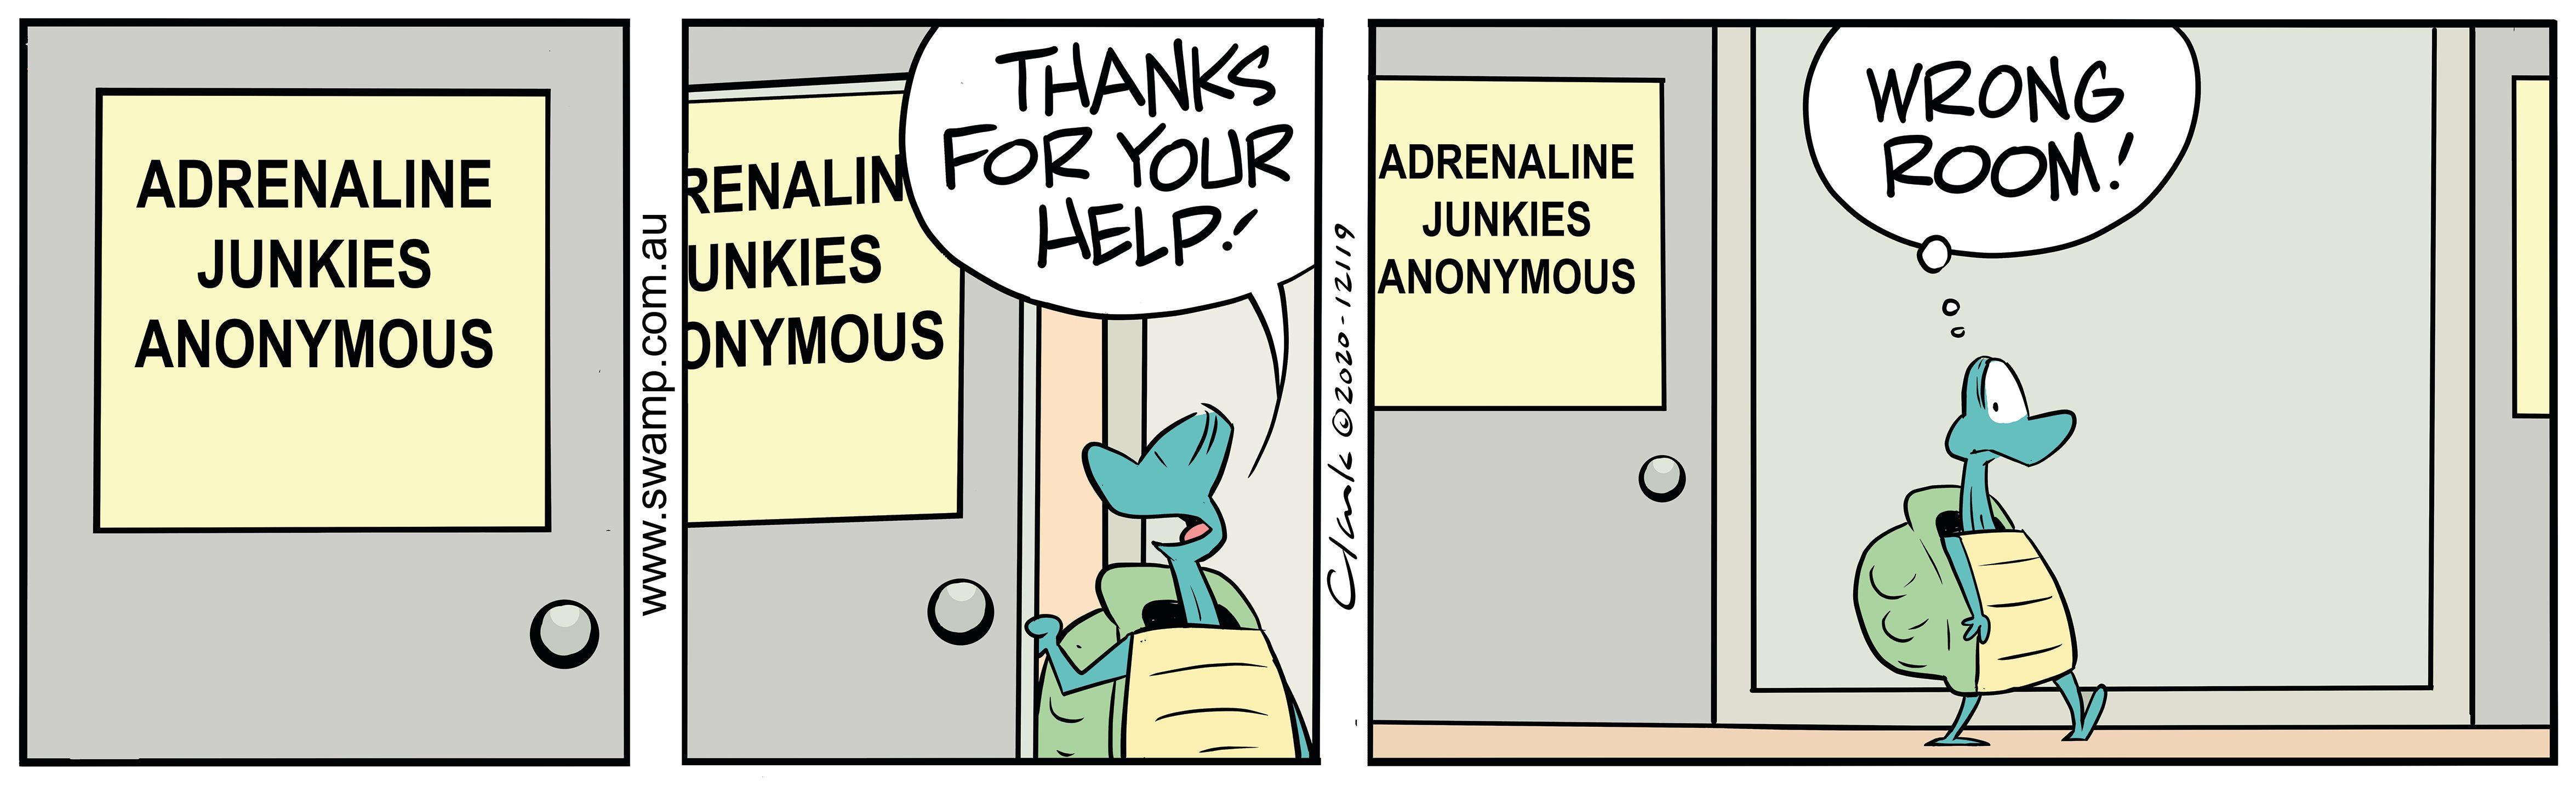 Adrenalin Junkies Anonymous